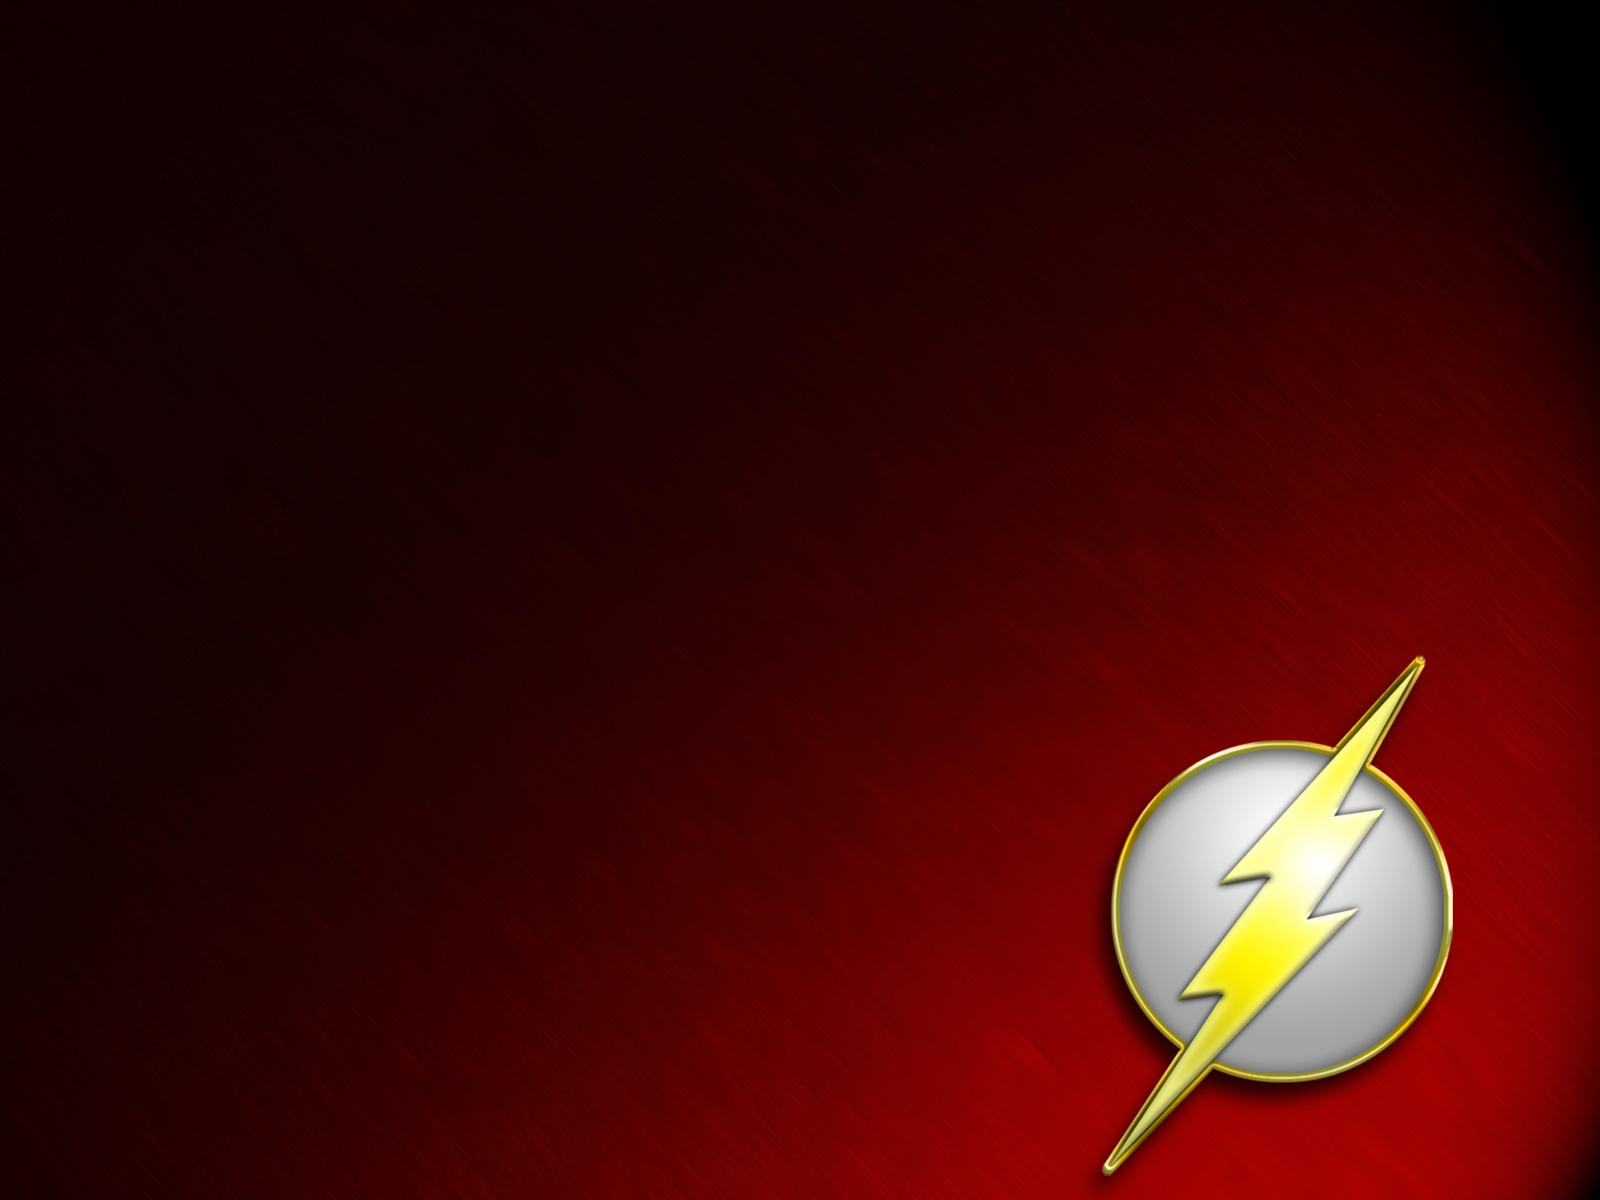 Flash   Raio Wallpaper para Download no Celular ou Computador PC 1600x1200